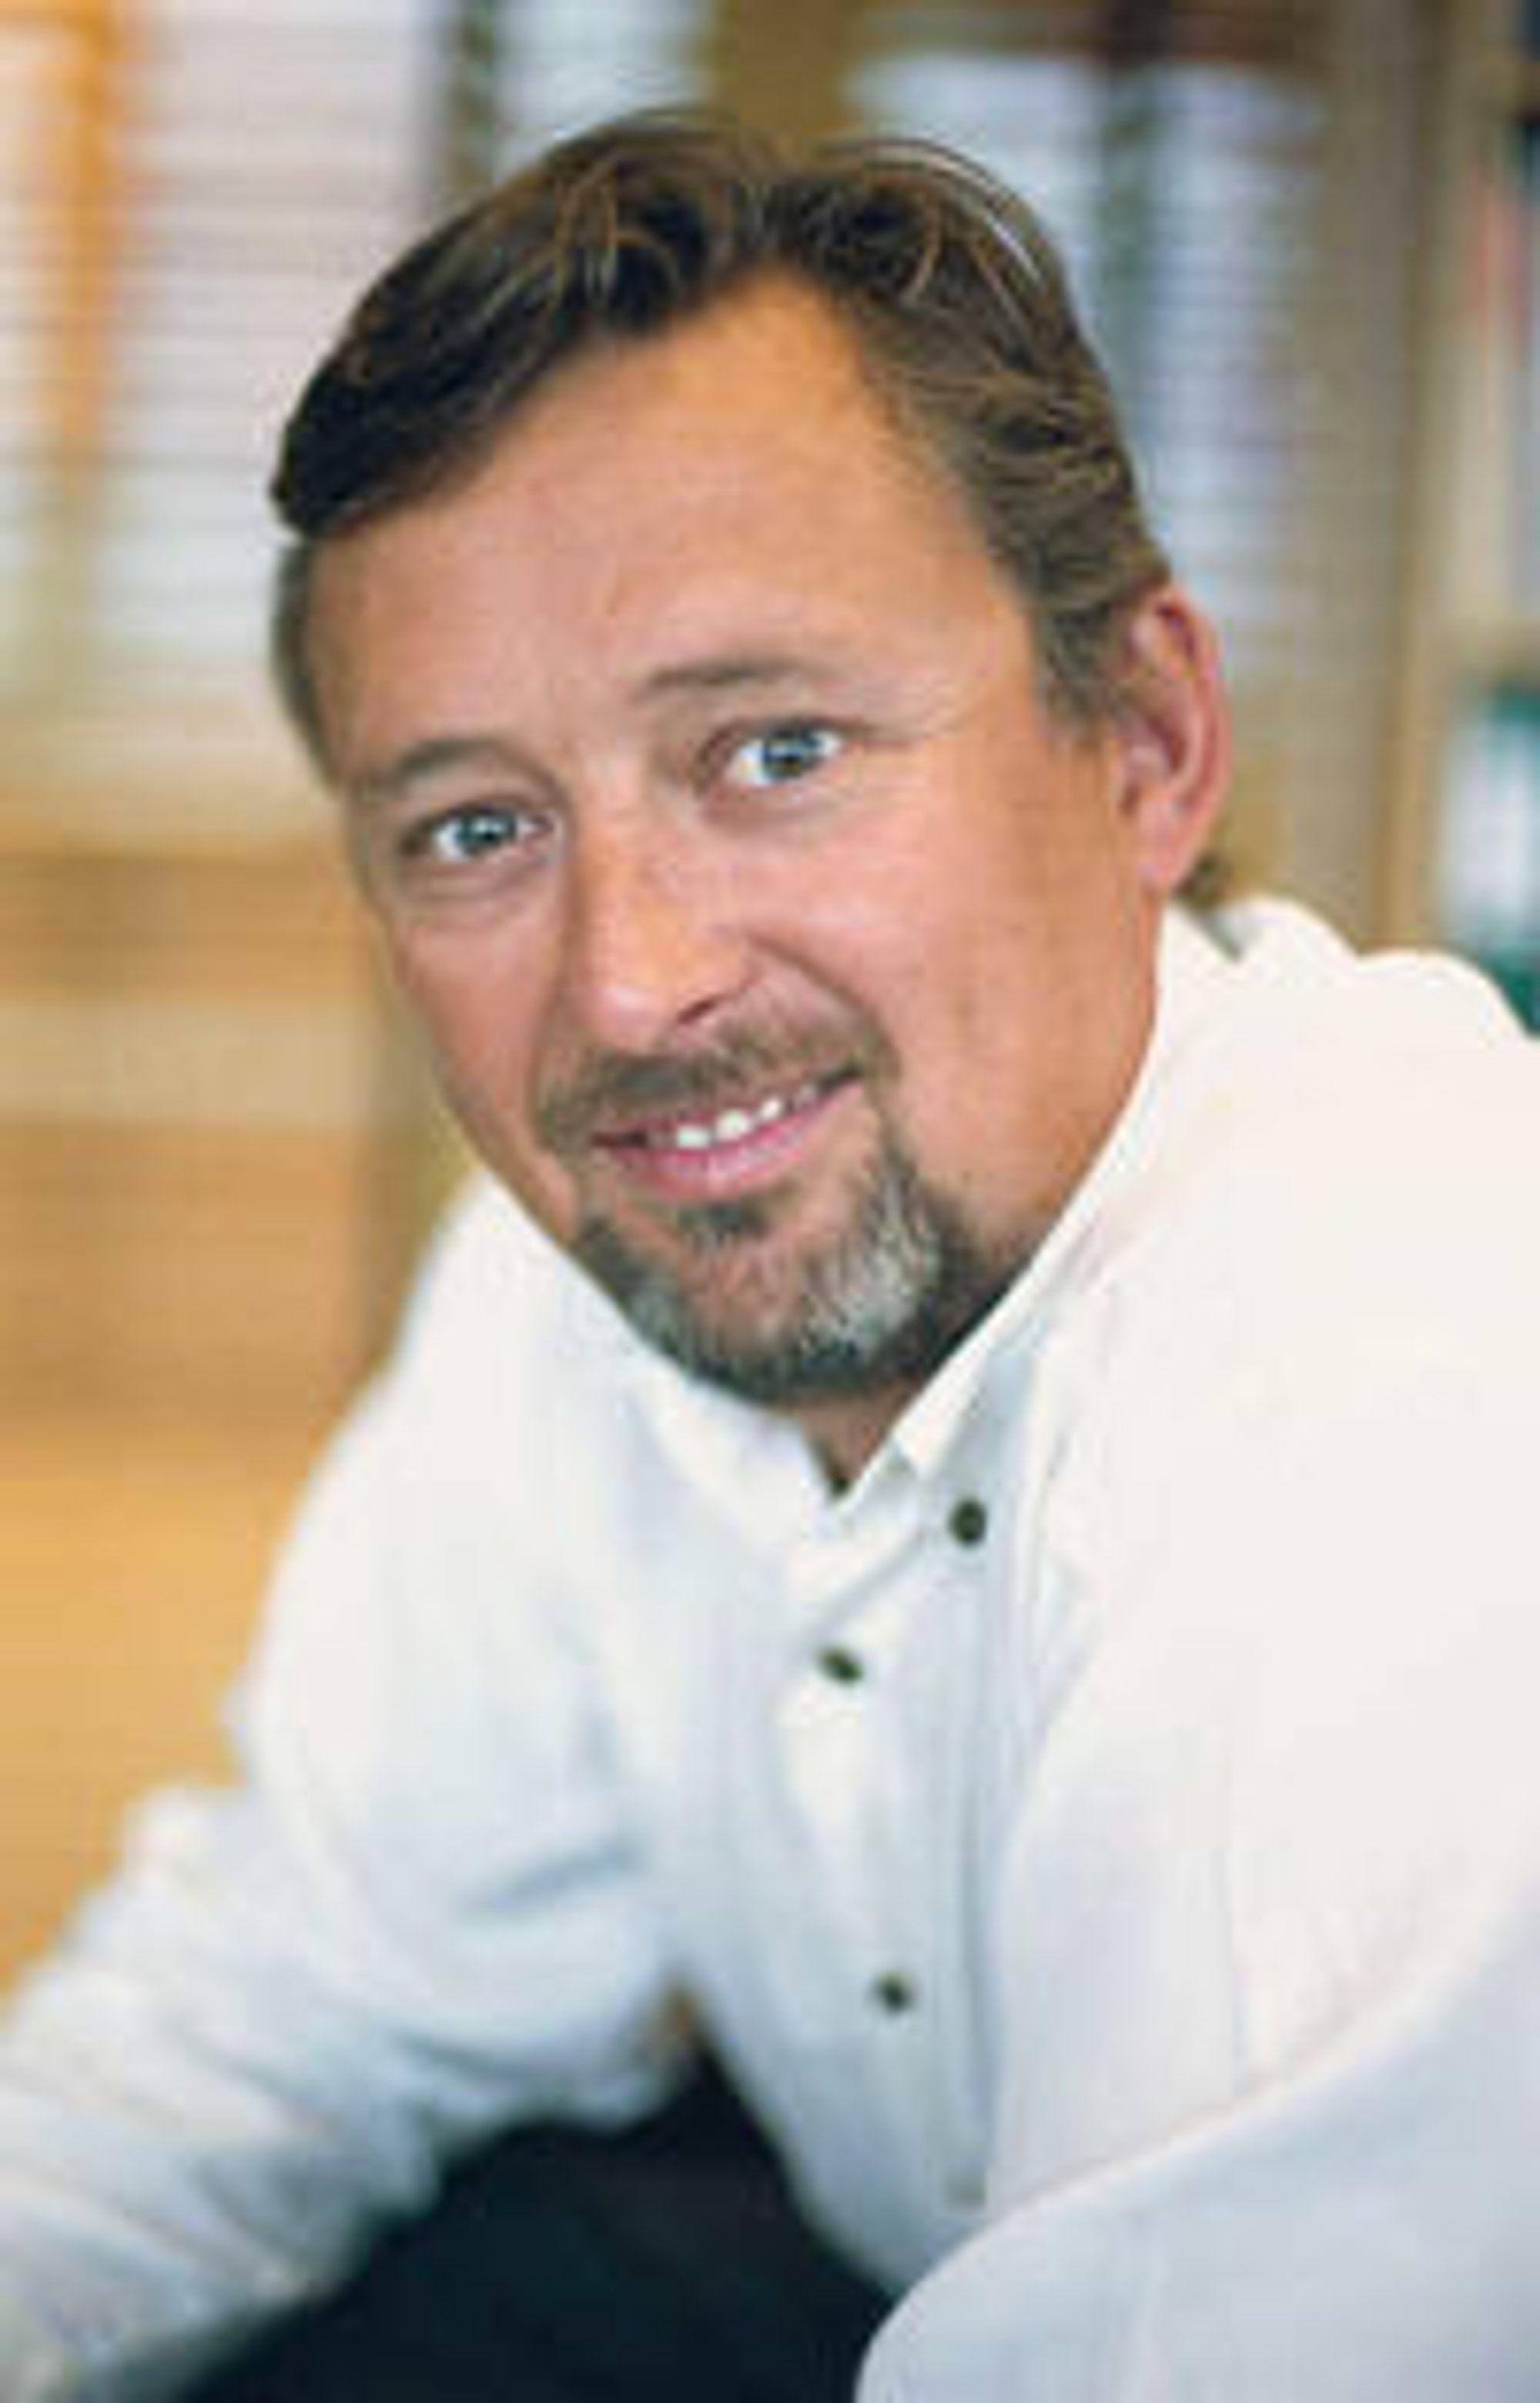 Adm.dir Steinar Sønsteby i Atea.